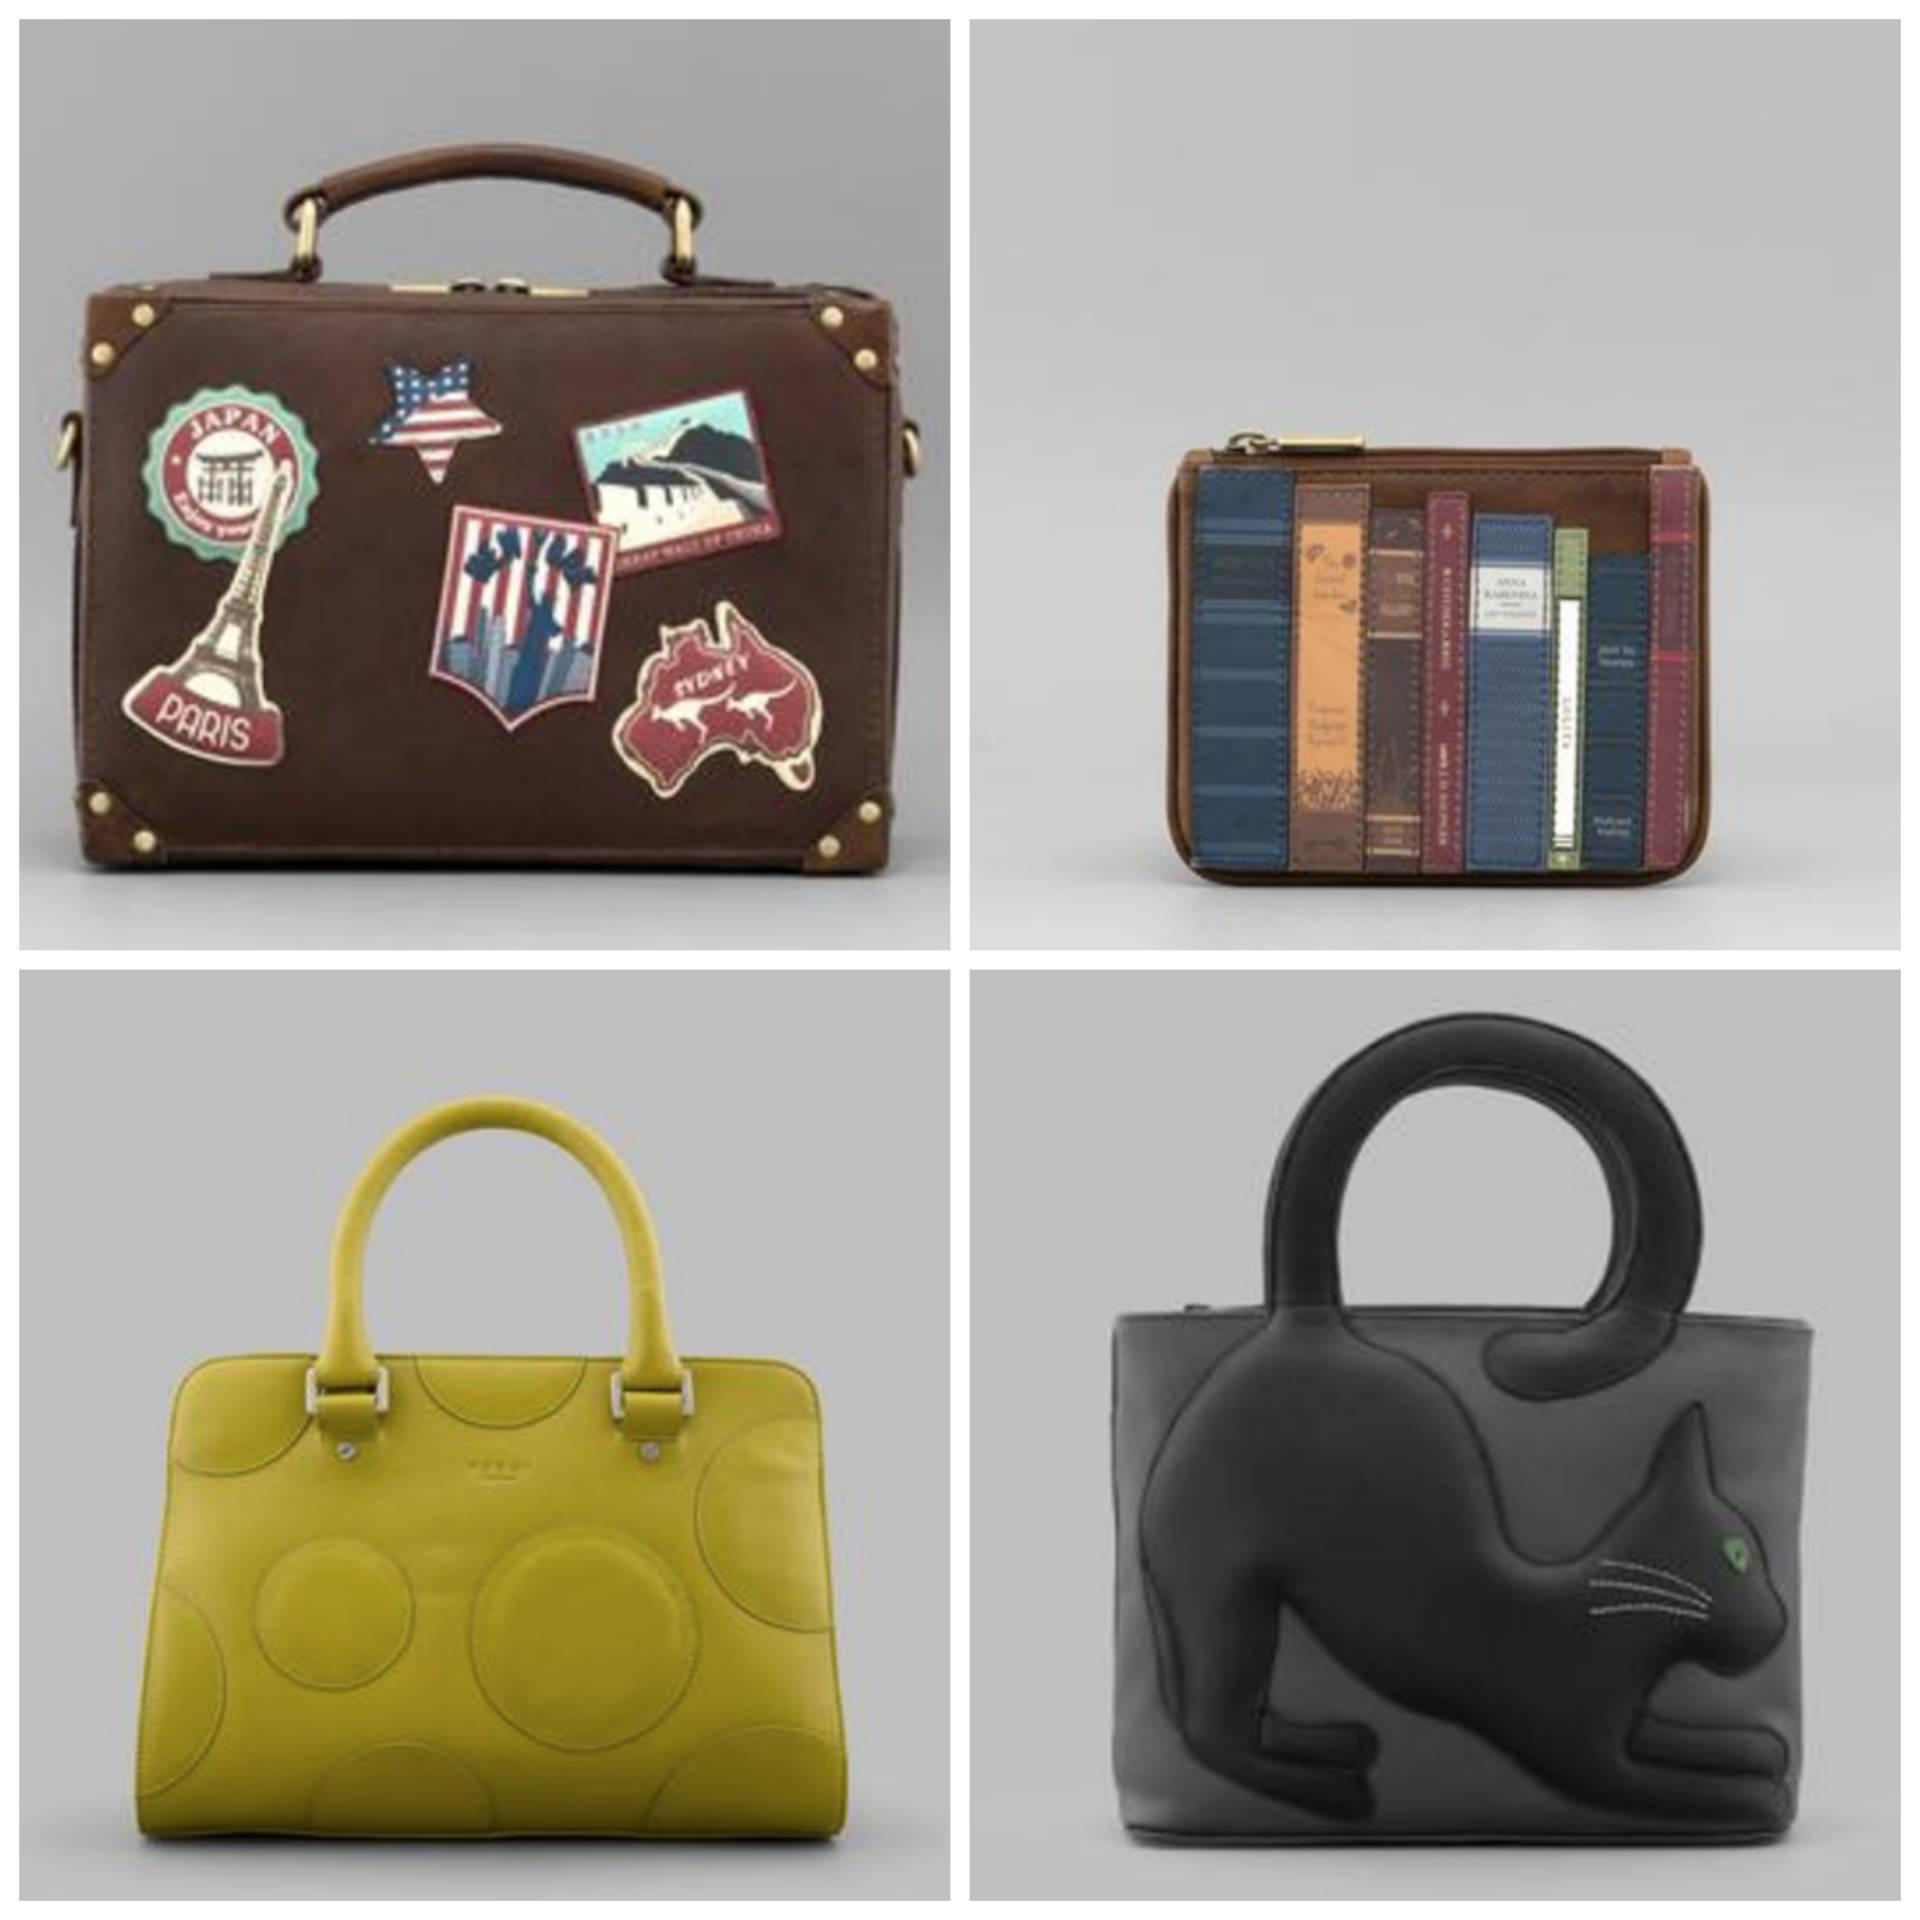 yoshi-lichfield-bags-cat-yellow-travel-bookworm